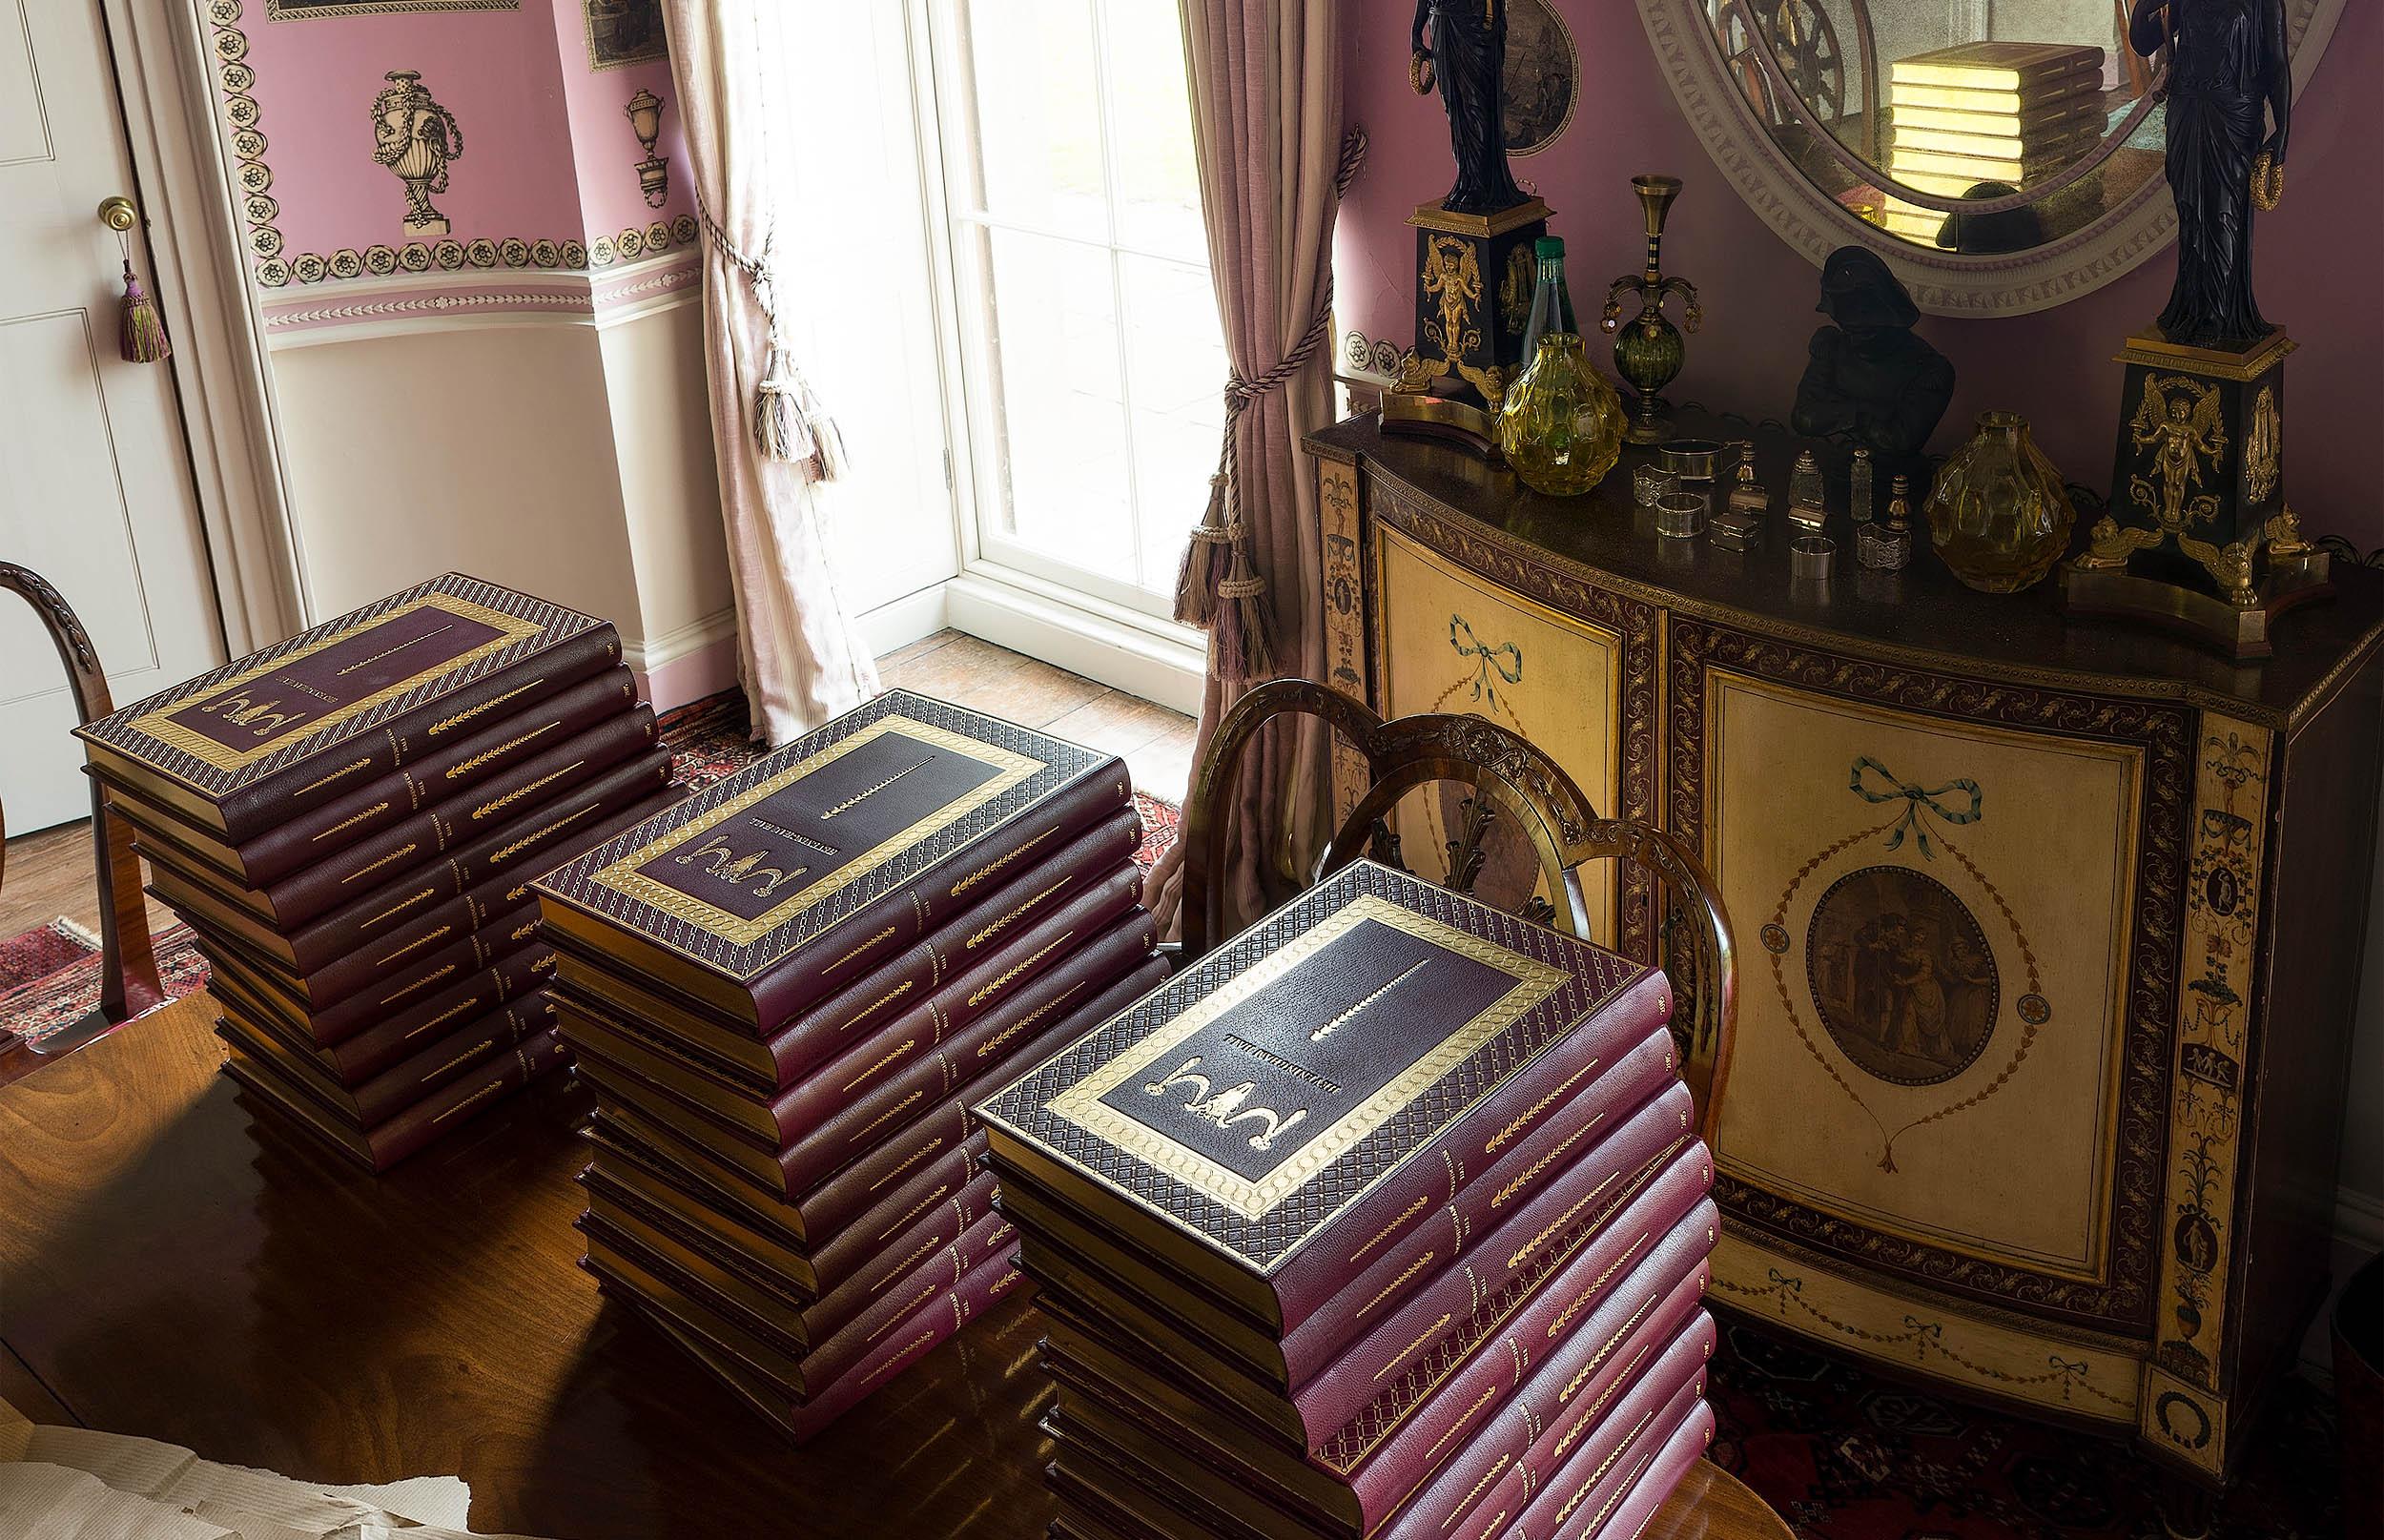 Heveningham Hall 2015, Edition of 28 Books